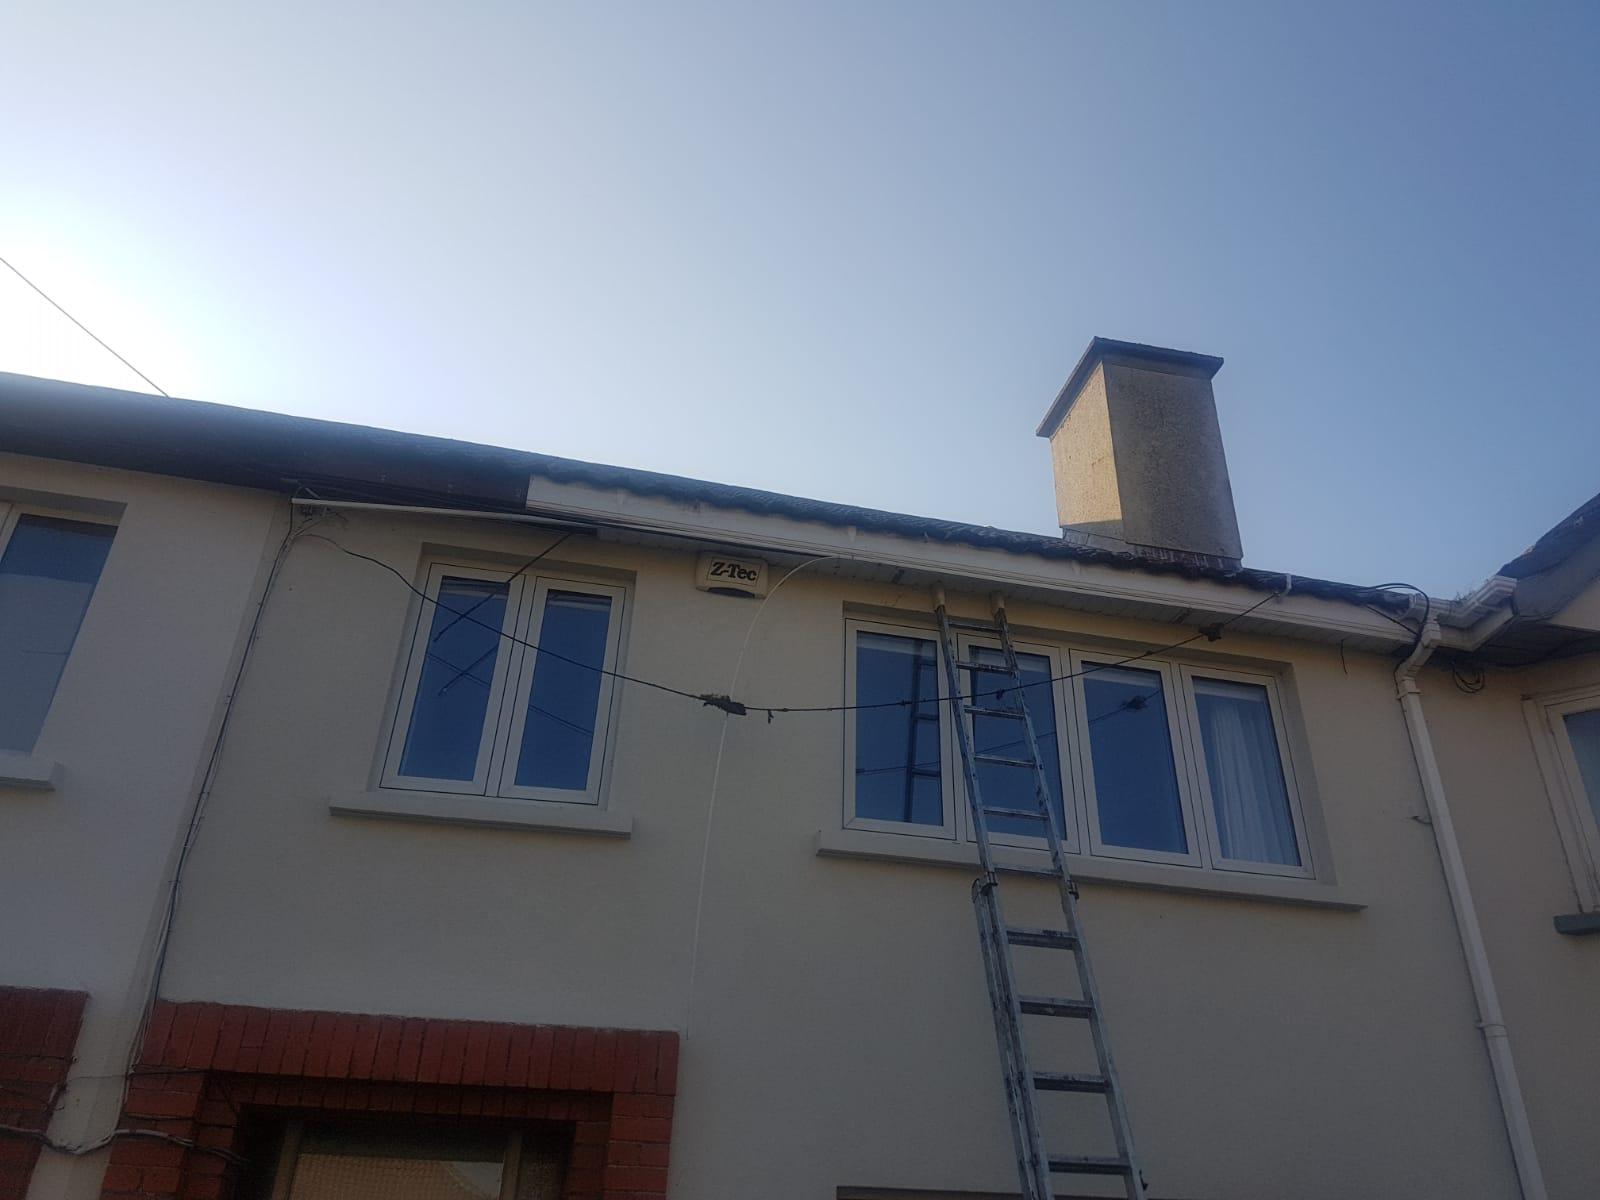 Gutter Repairs in Celbridge, Co. Kildare